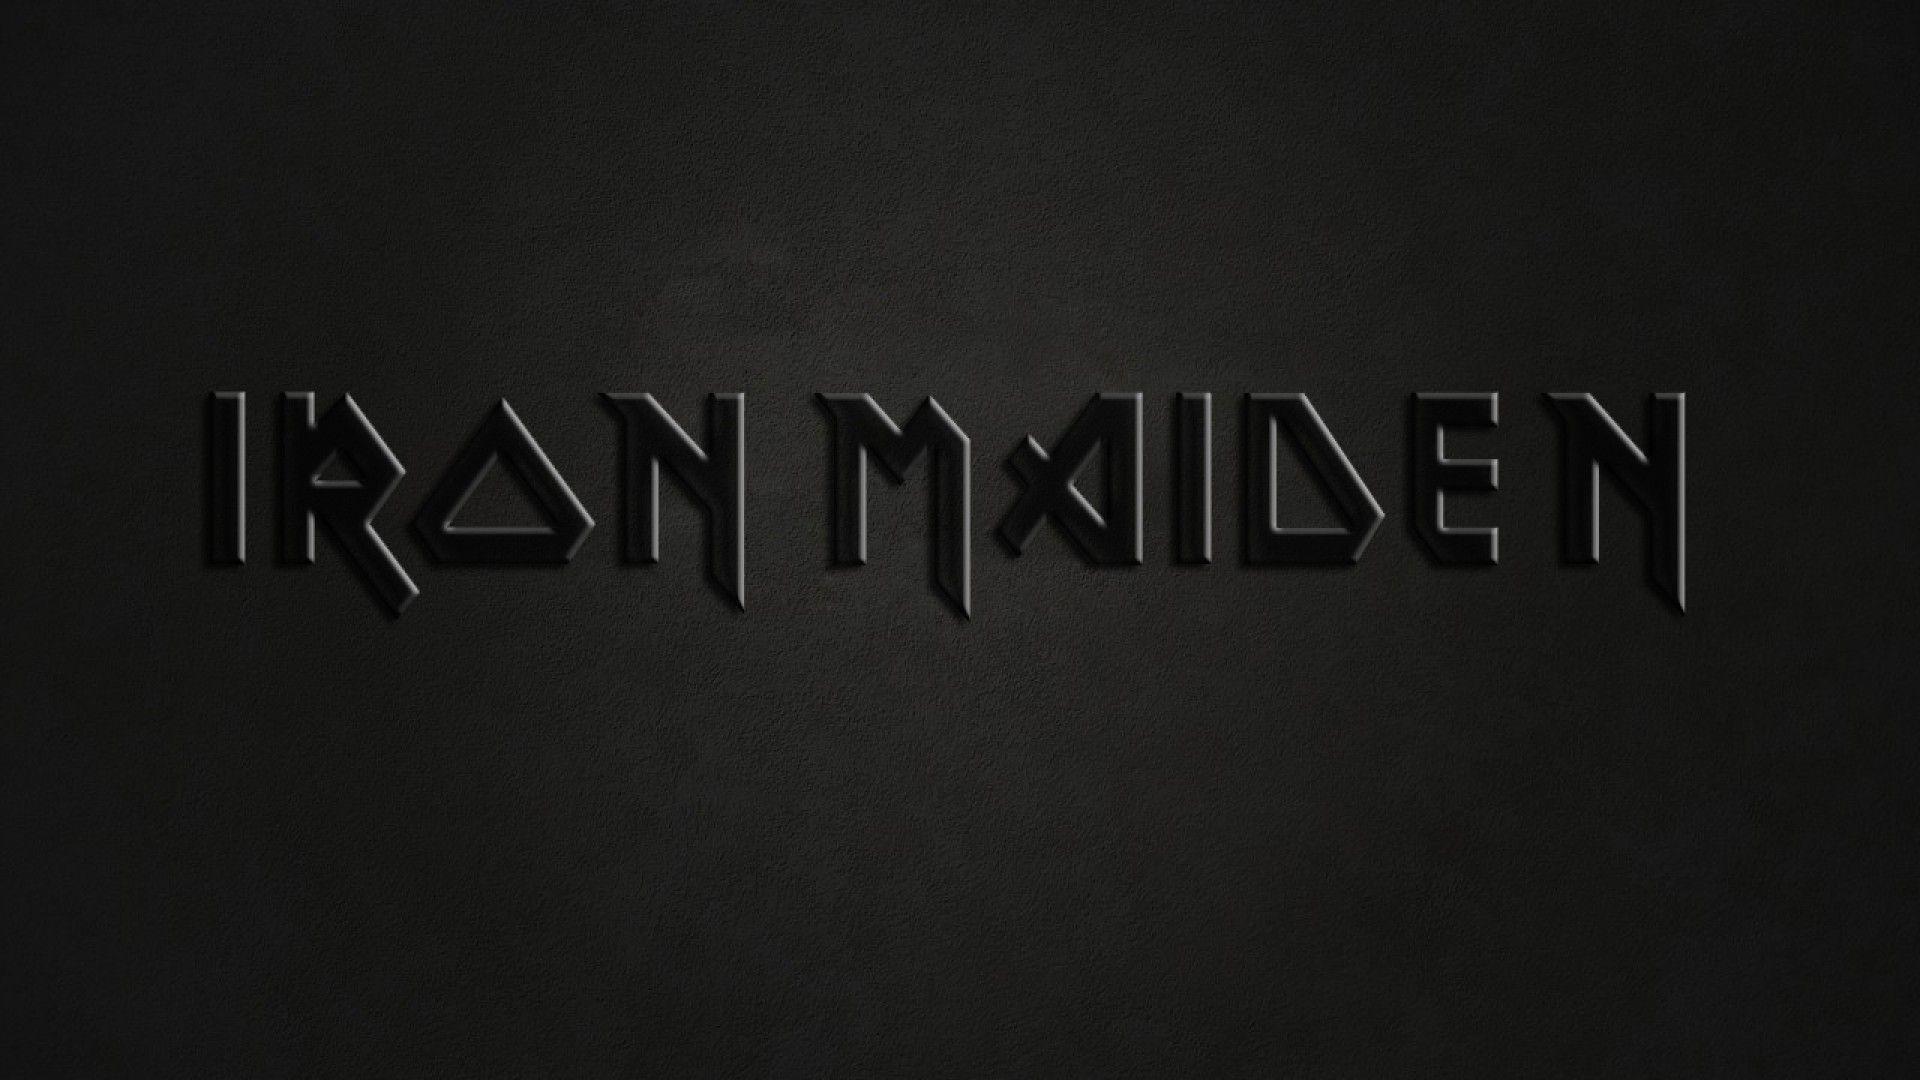 Full HD 1080p <b>Iron maiden Wallpapers</b> HD, <